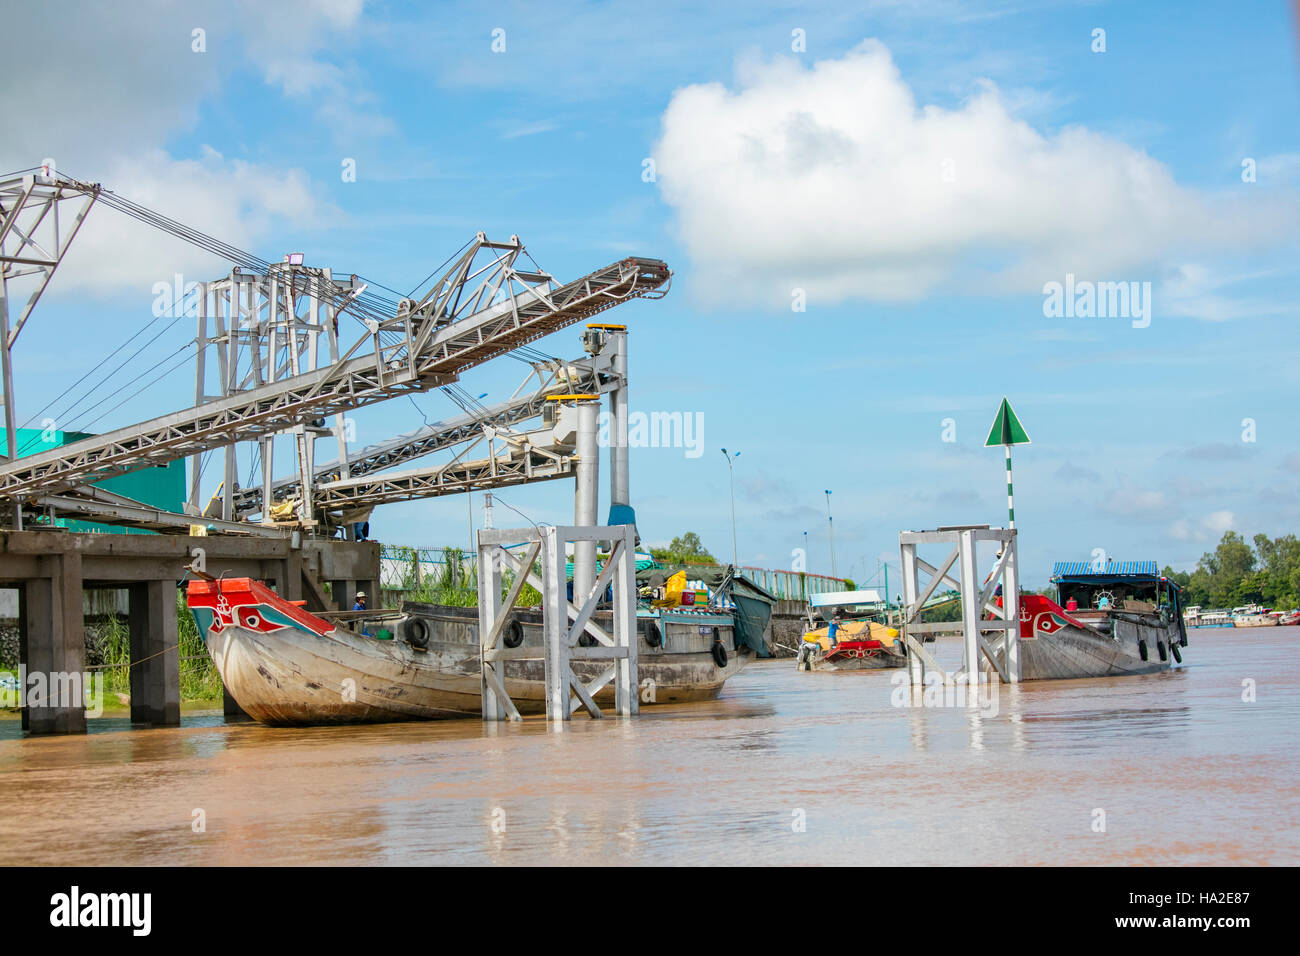 Chau Doc, Vietnam, Asia - Stock Image